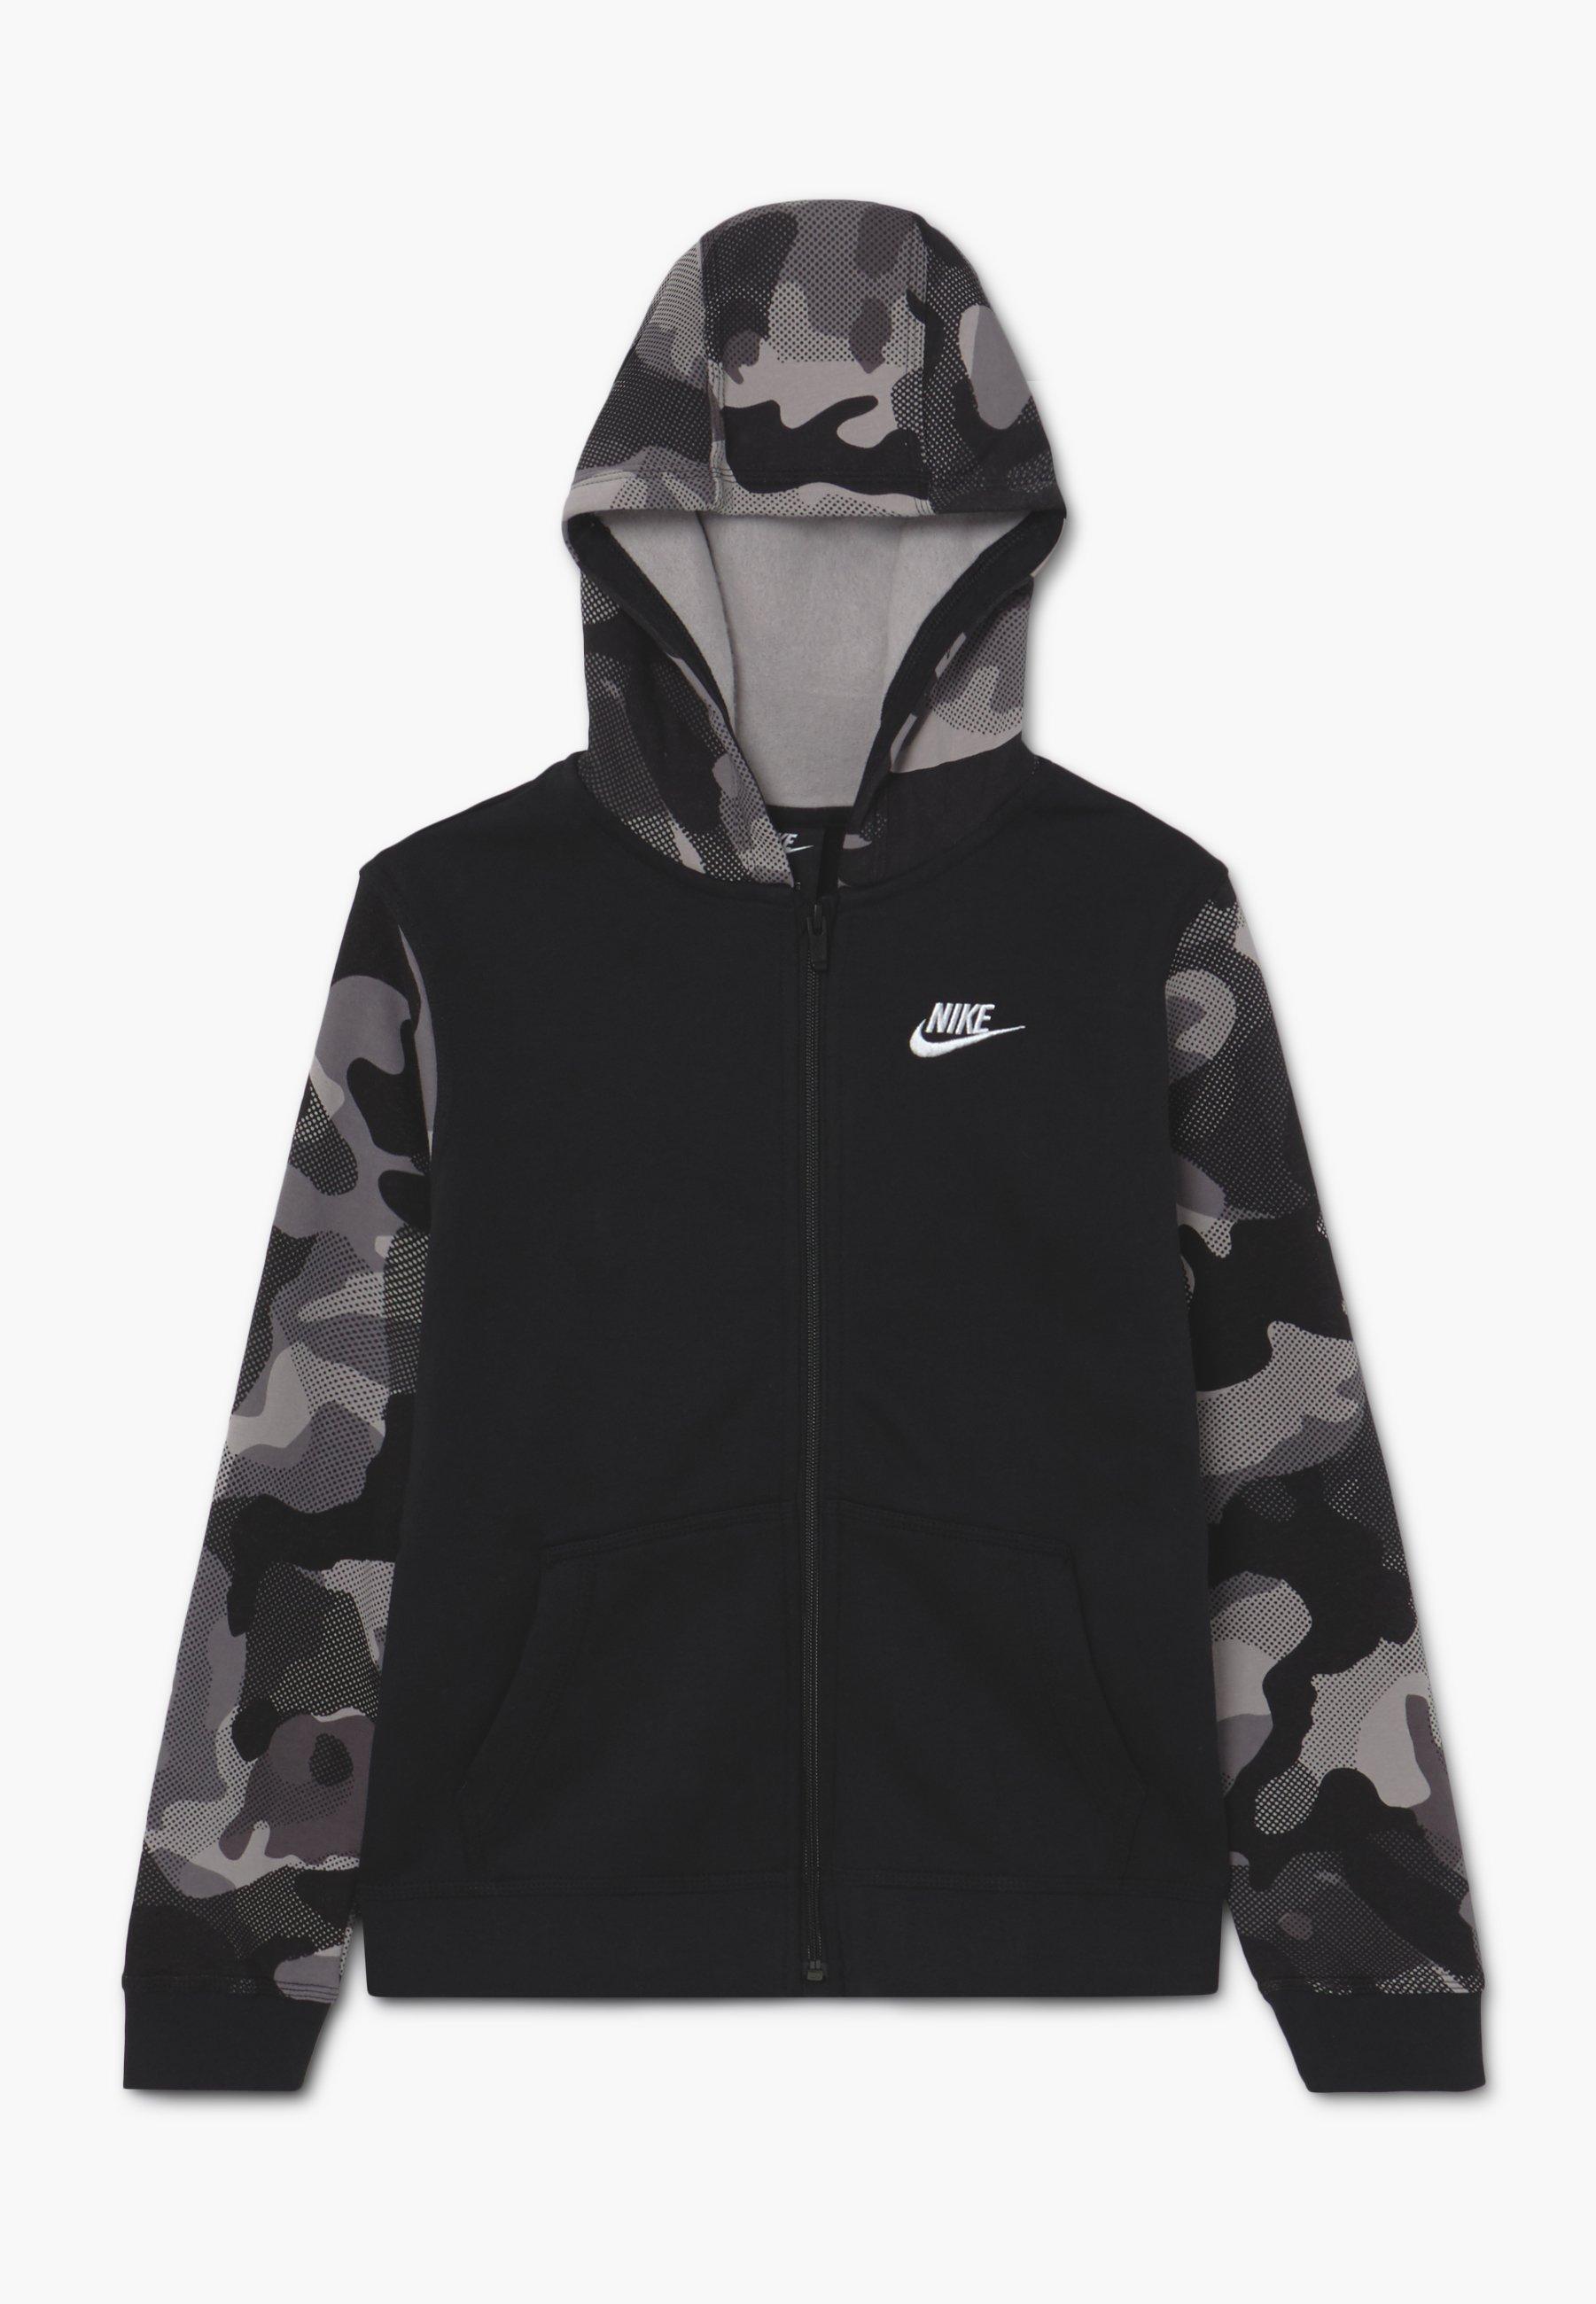 CLUB veste en sweat zippée blackwhite